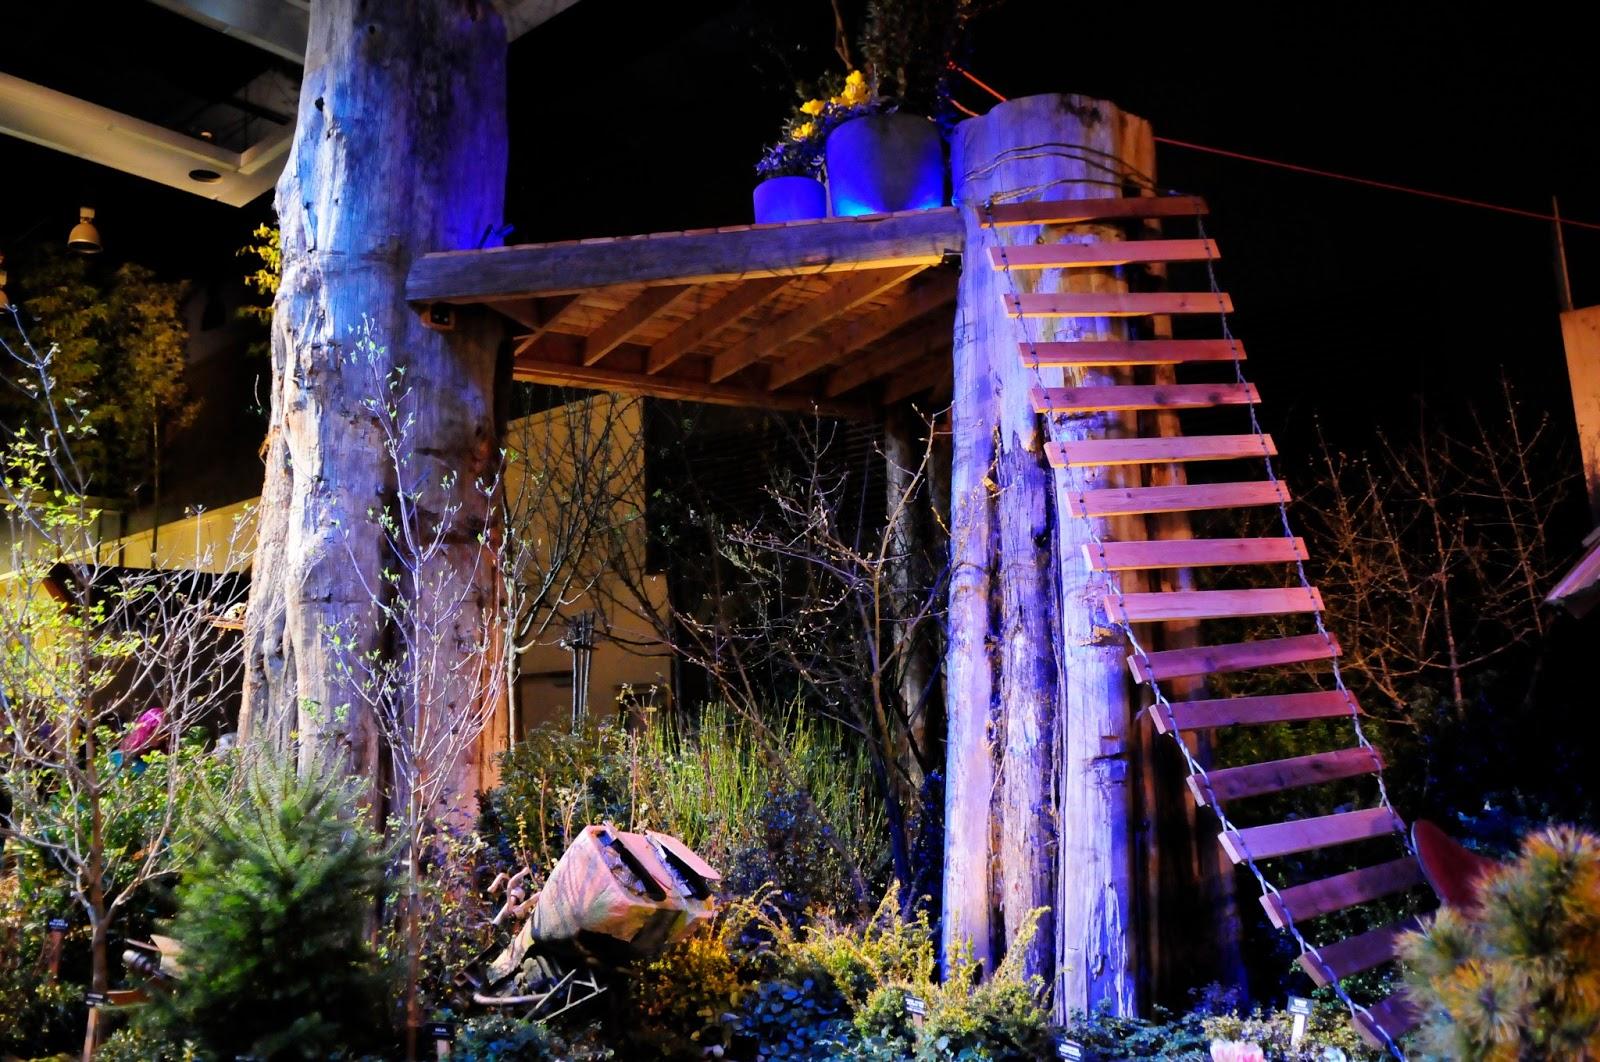 Megan seagren 39 s journal backyard ideas from the 2013 - Northwest flower and garden show ...